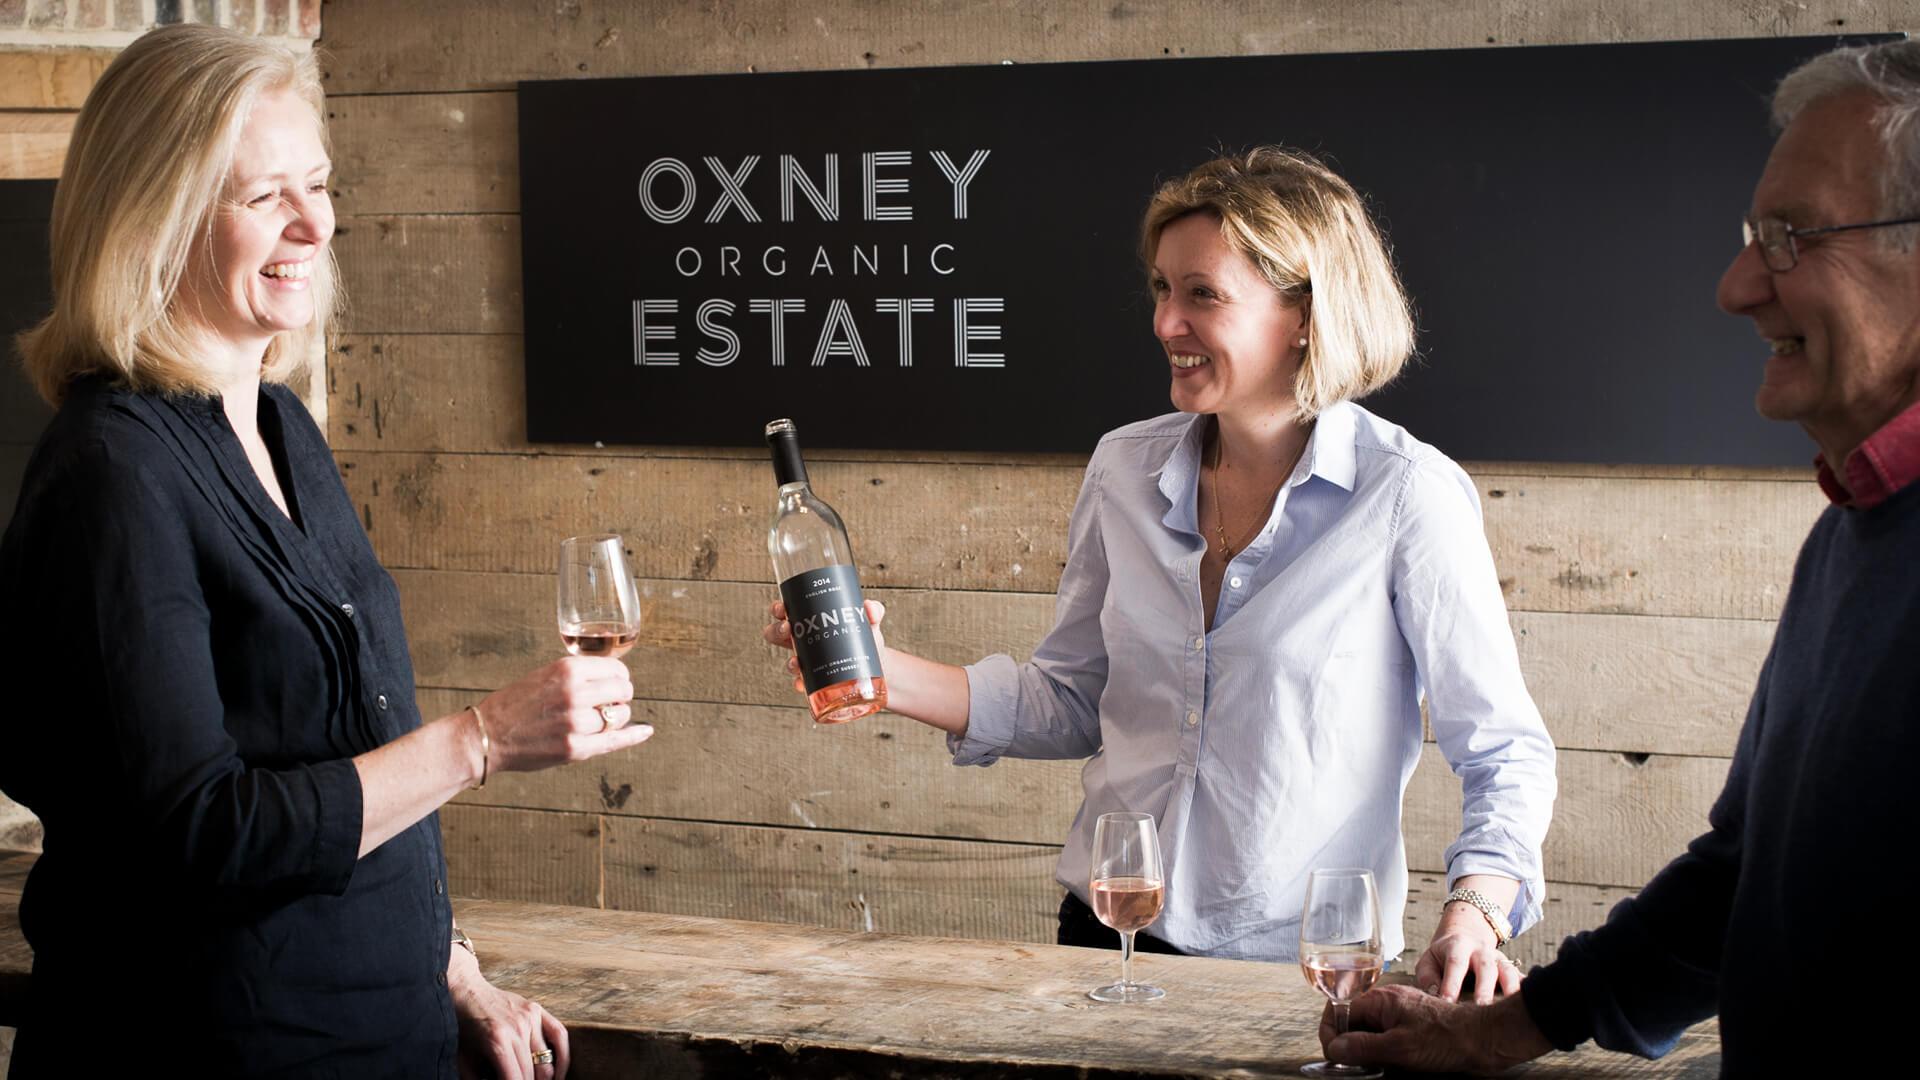 oxney organic estate wine tasting centre signage event branding